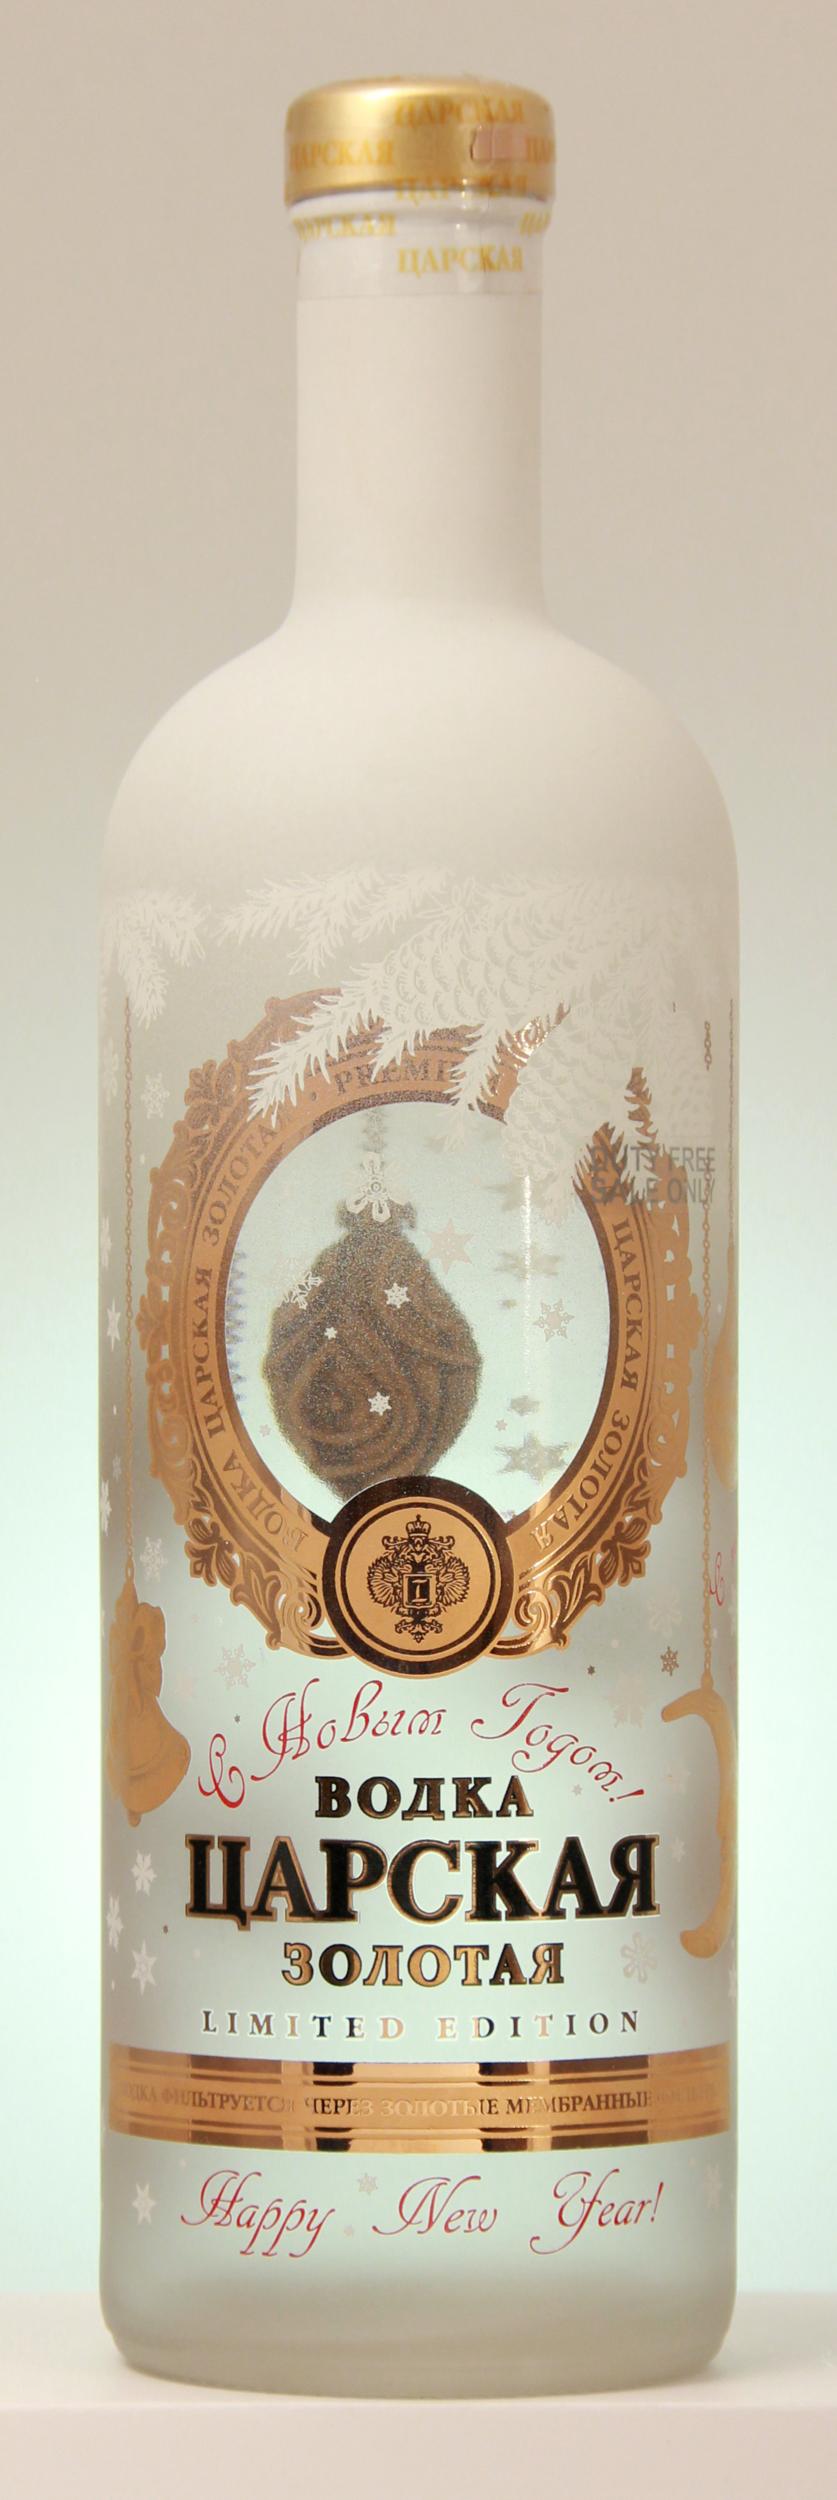 Vodka Tsarskaya Gold Spécial Noël 1 litre New Year Edition Limitée